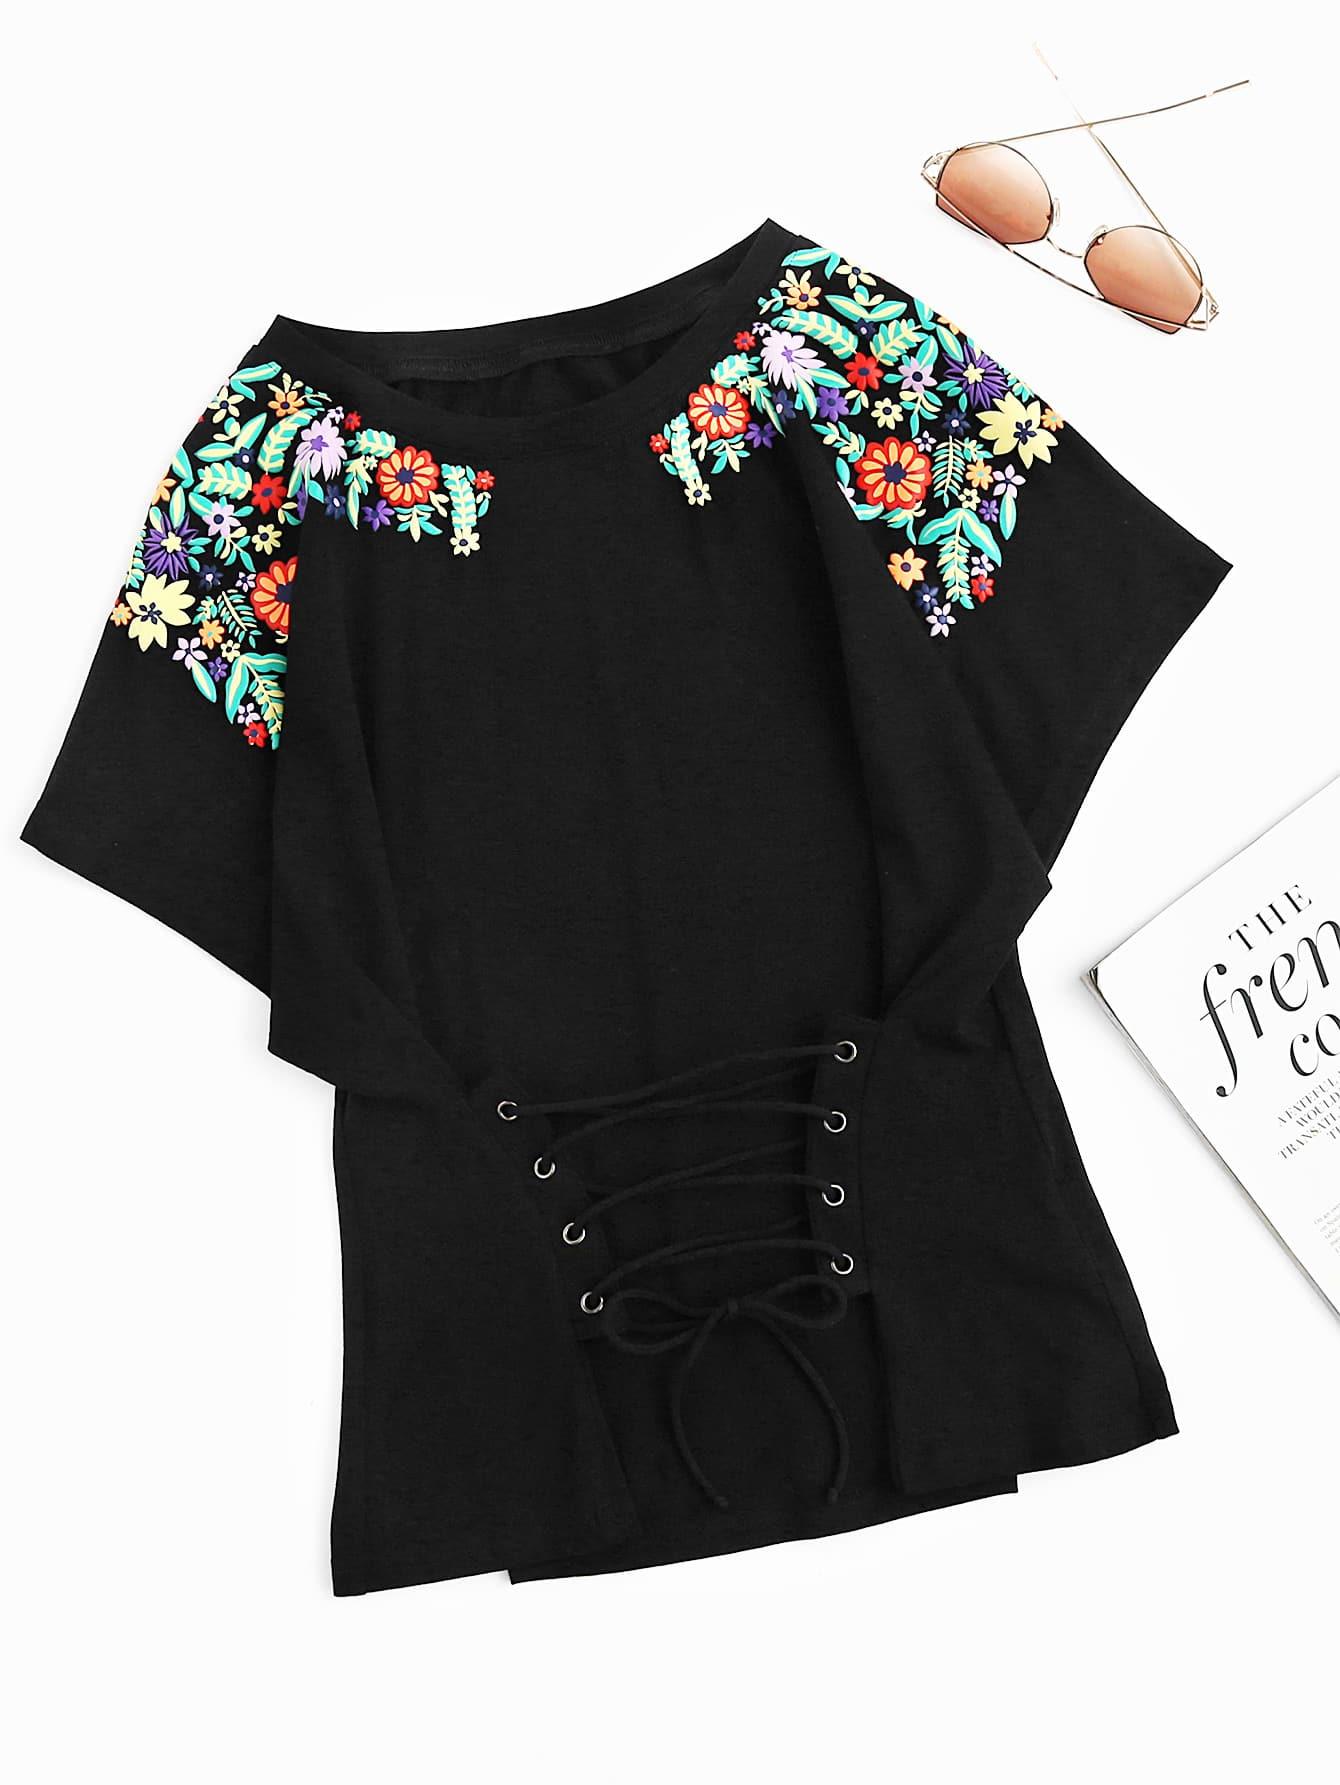 Фото Flower Print Lace Up Dolman T-shirt. Купить с доставкой